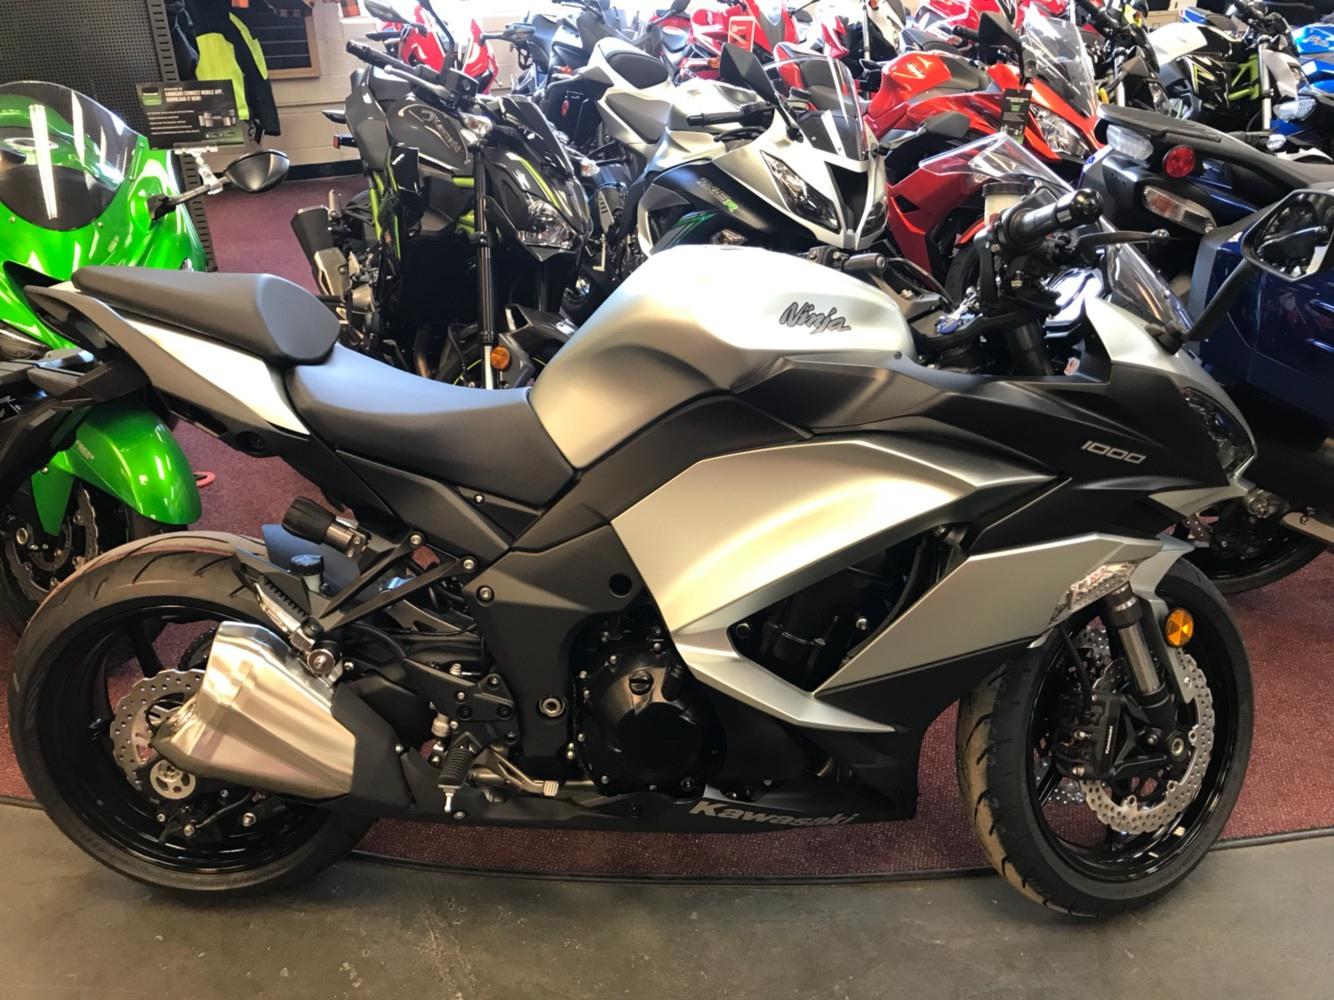 2018 Kawasaki Ninja 1000 Abs Motorcycles Petersburg West Virginia